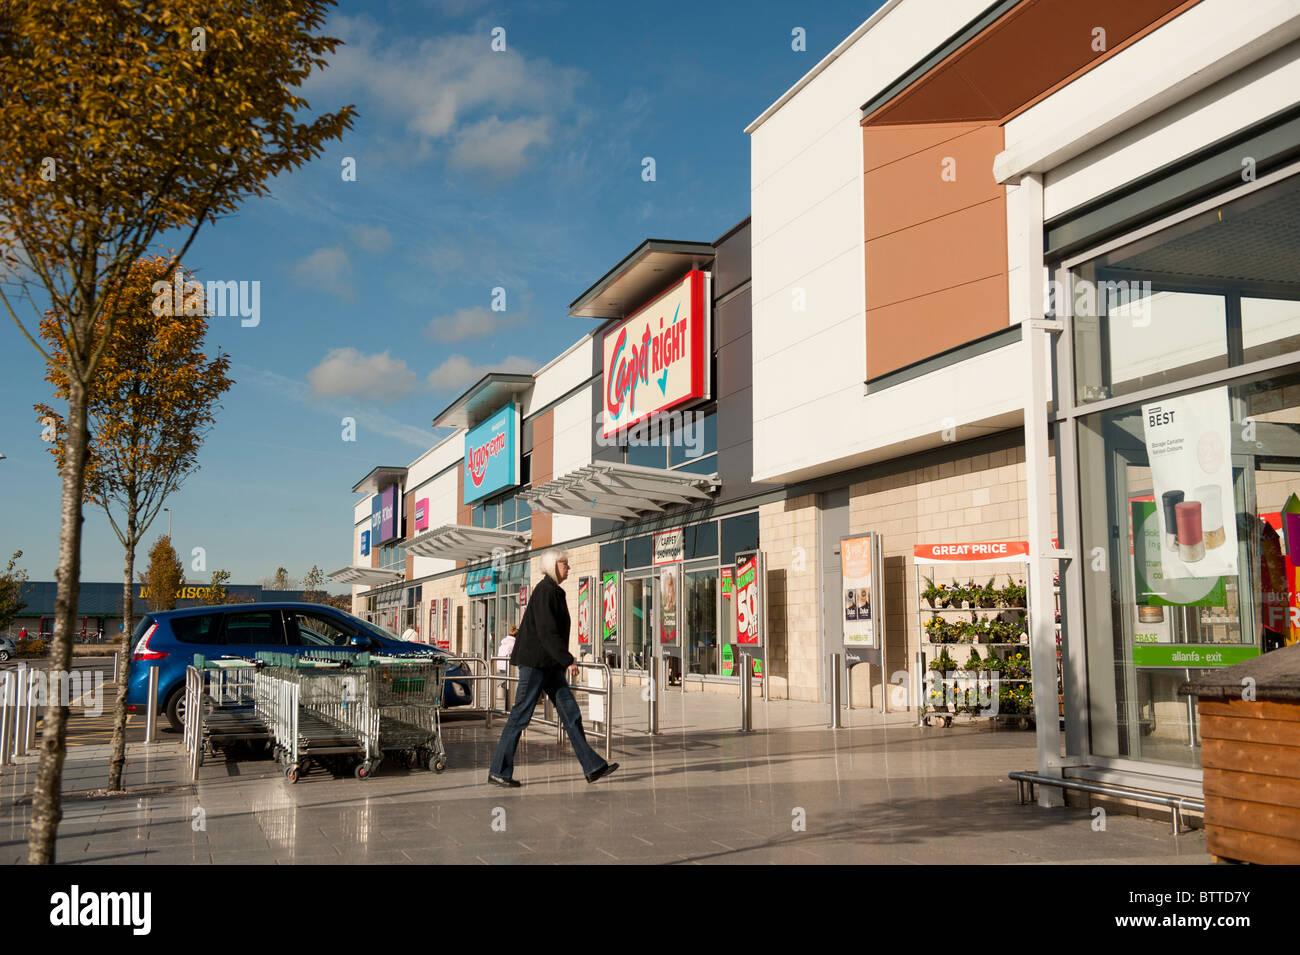 Pemberton  out of town Retail Park, Llanelli, Wales UK - Stock Image